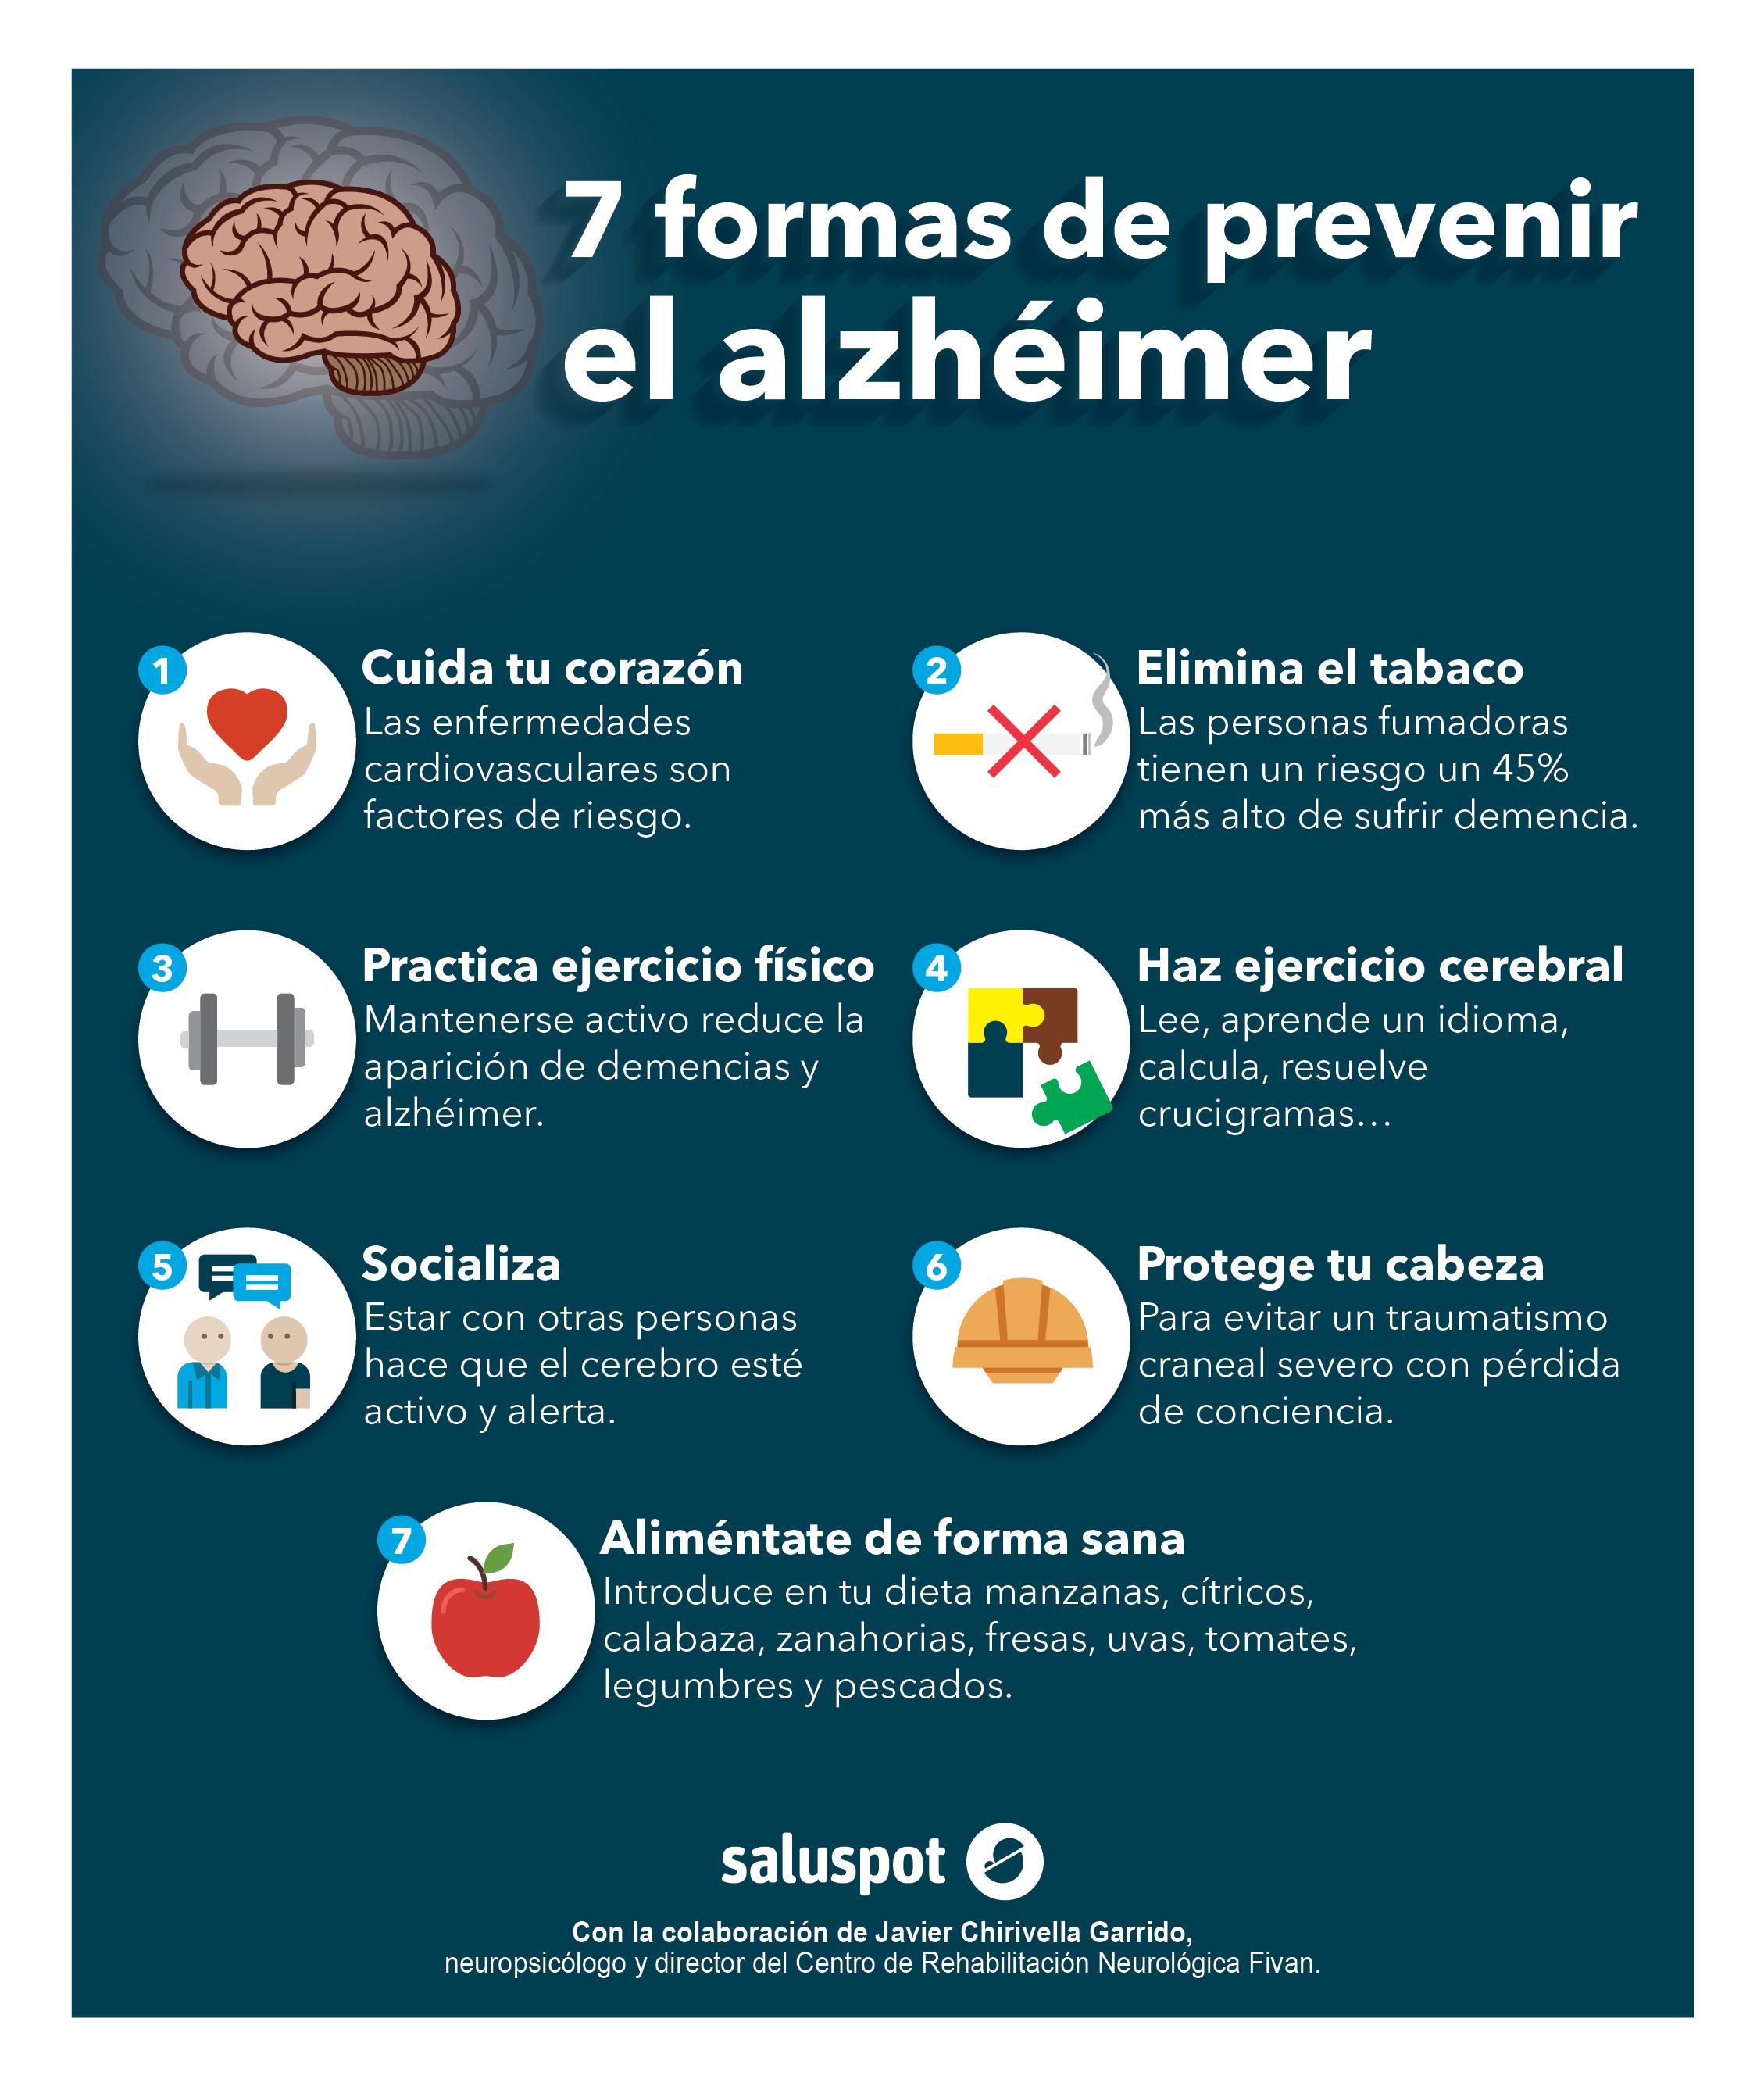 el alzheimer produce perdida de peso repentinas